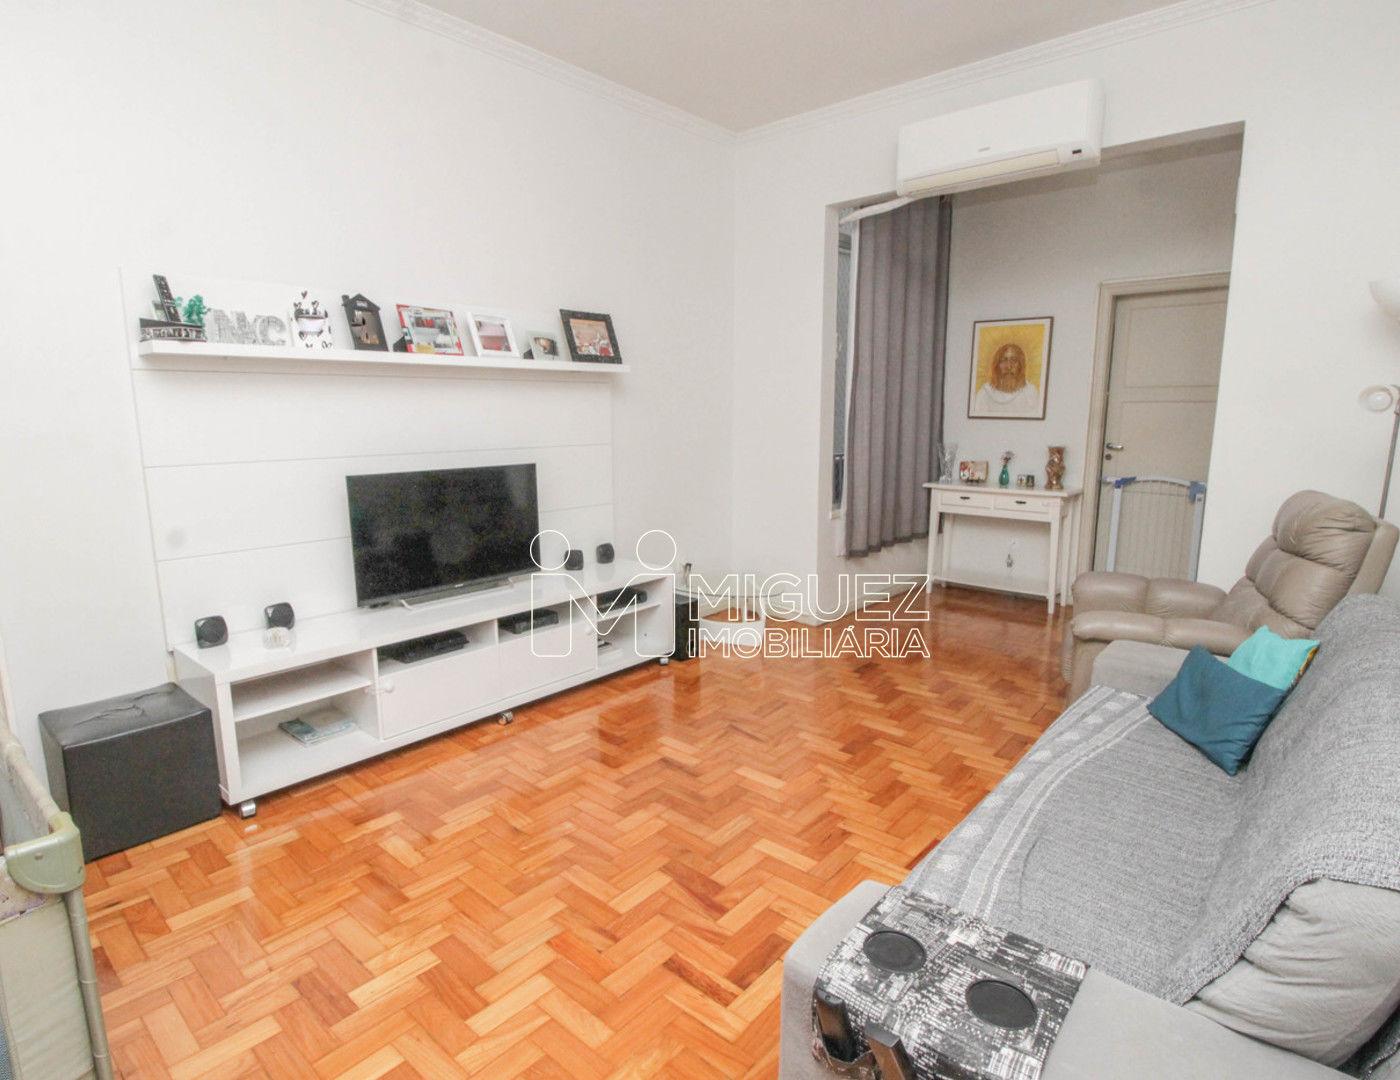 Apartamento, venda, Rua Valparaiso - Tijuca , Rio de janeiro